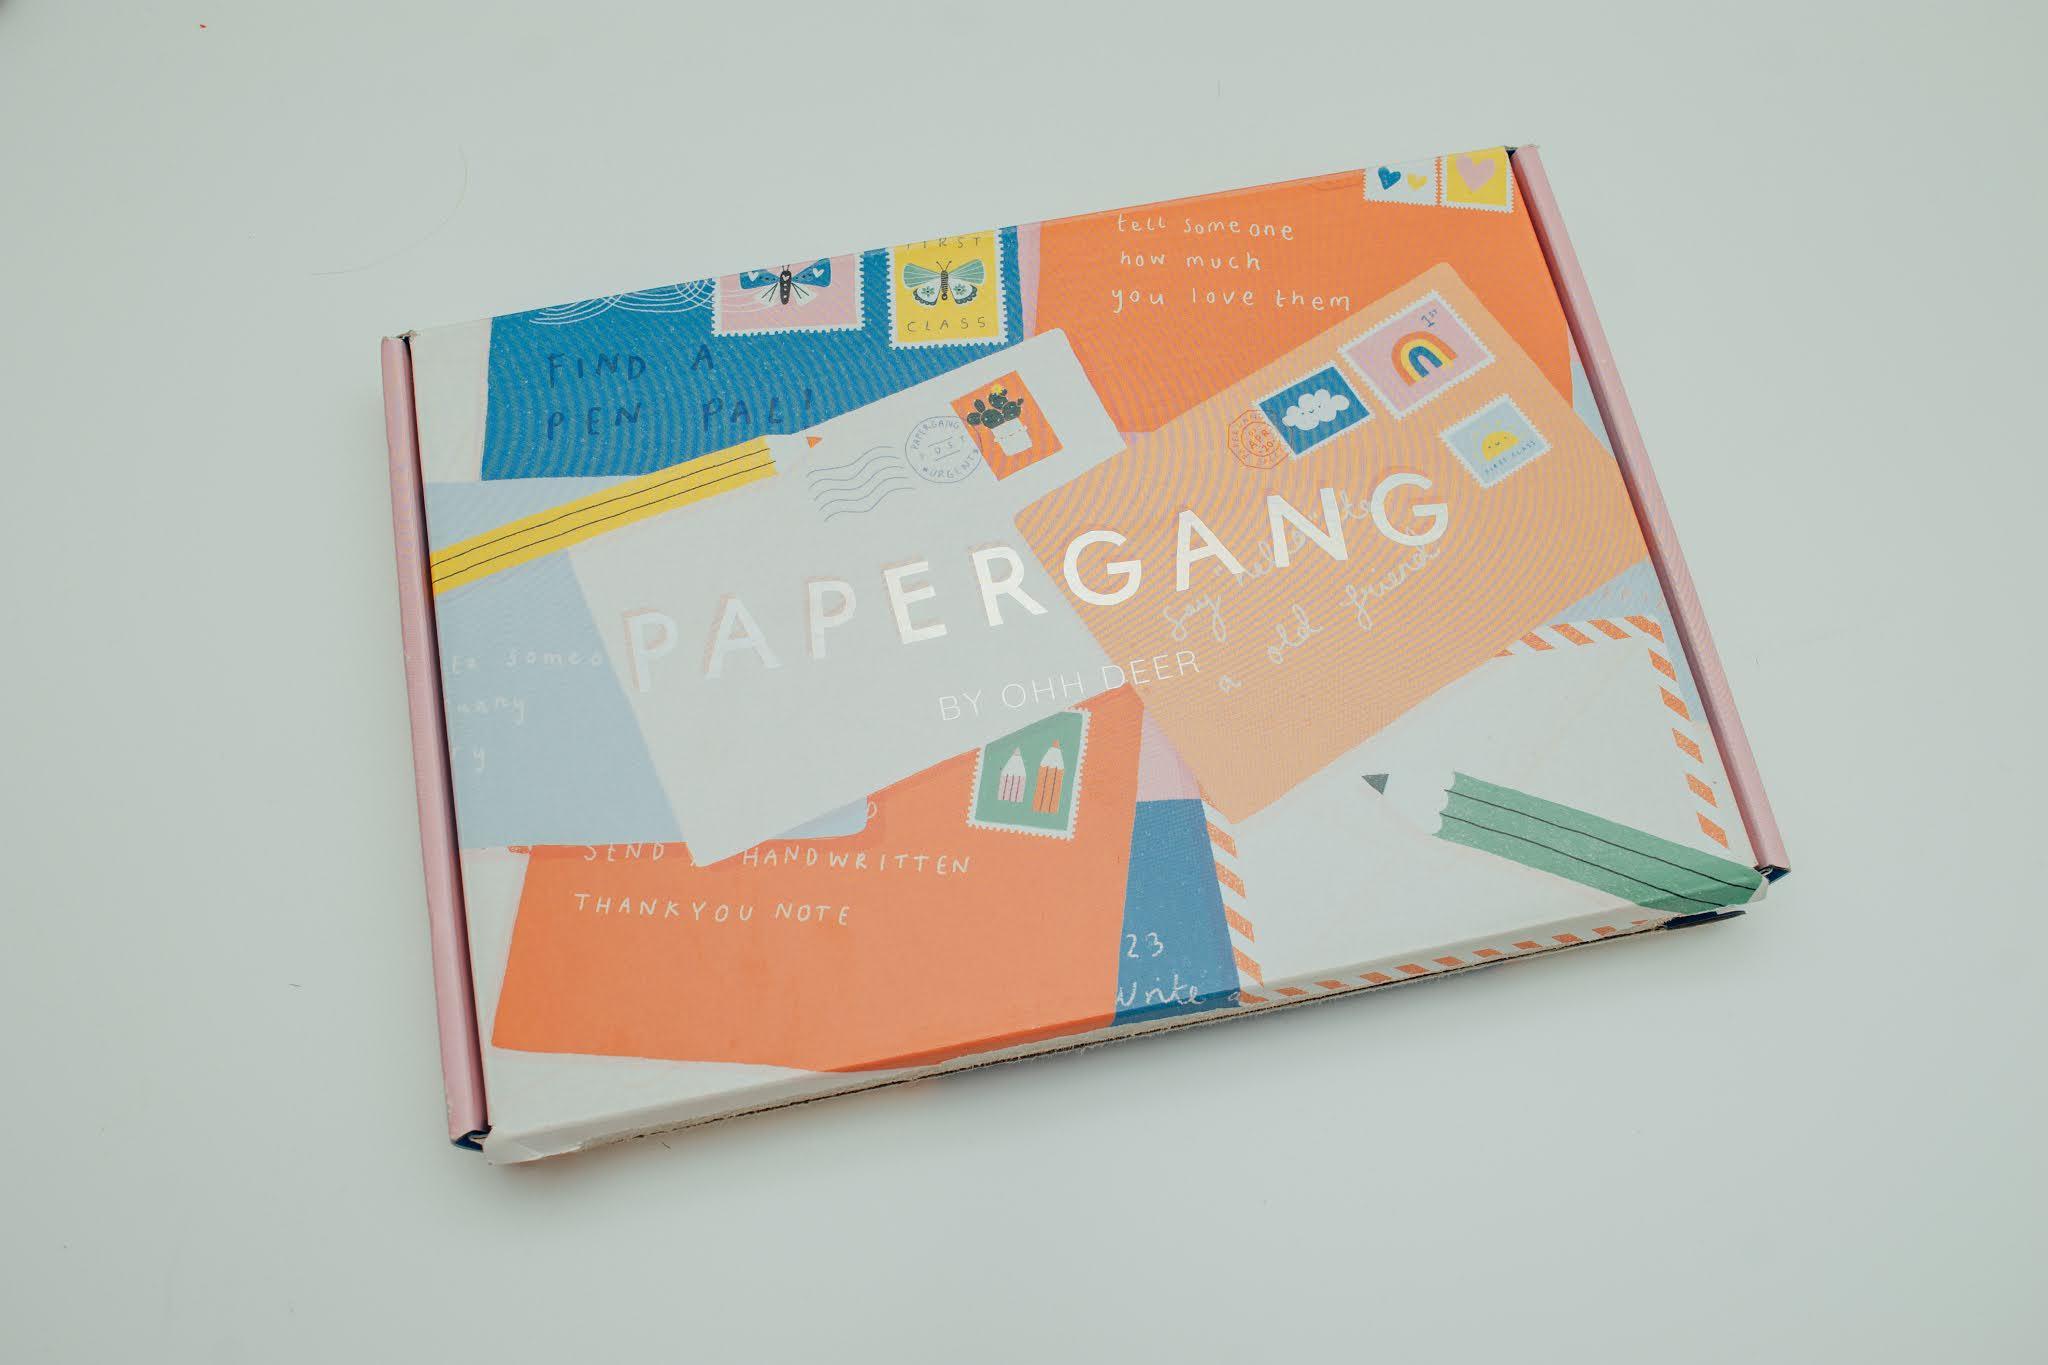 December 2020 Papergang box packaging